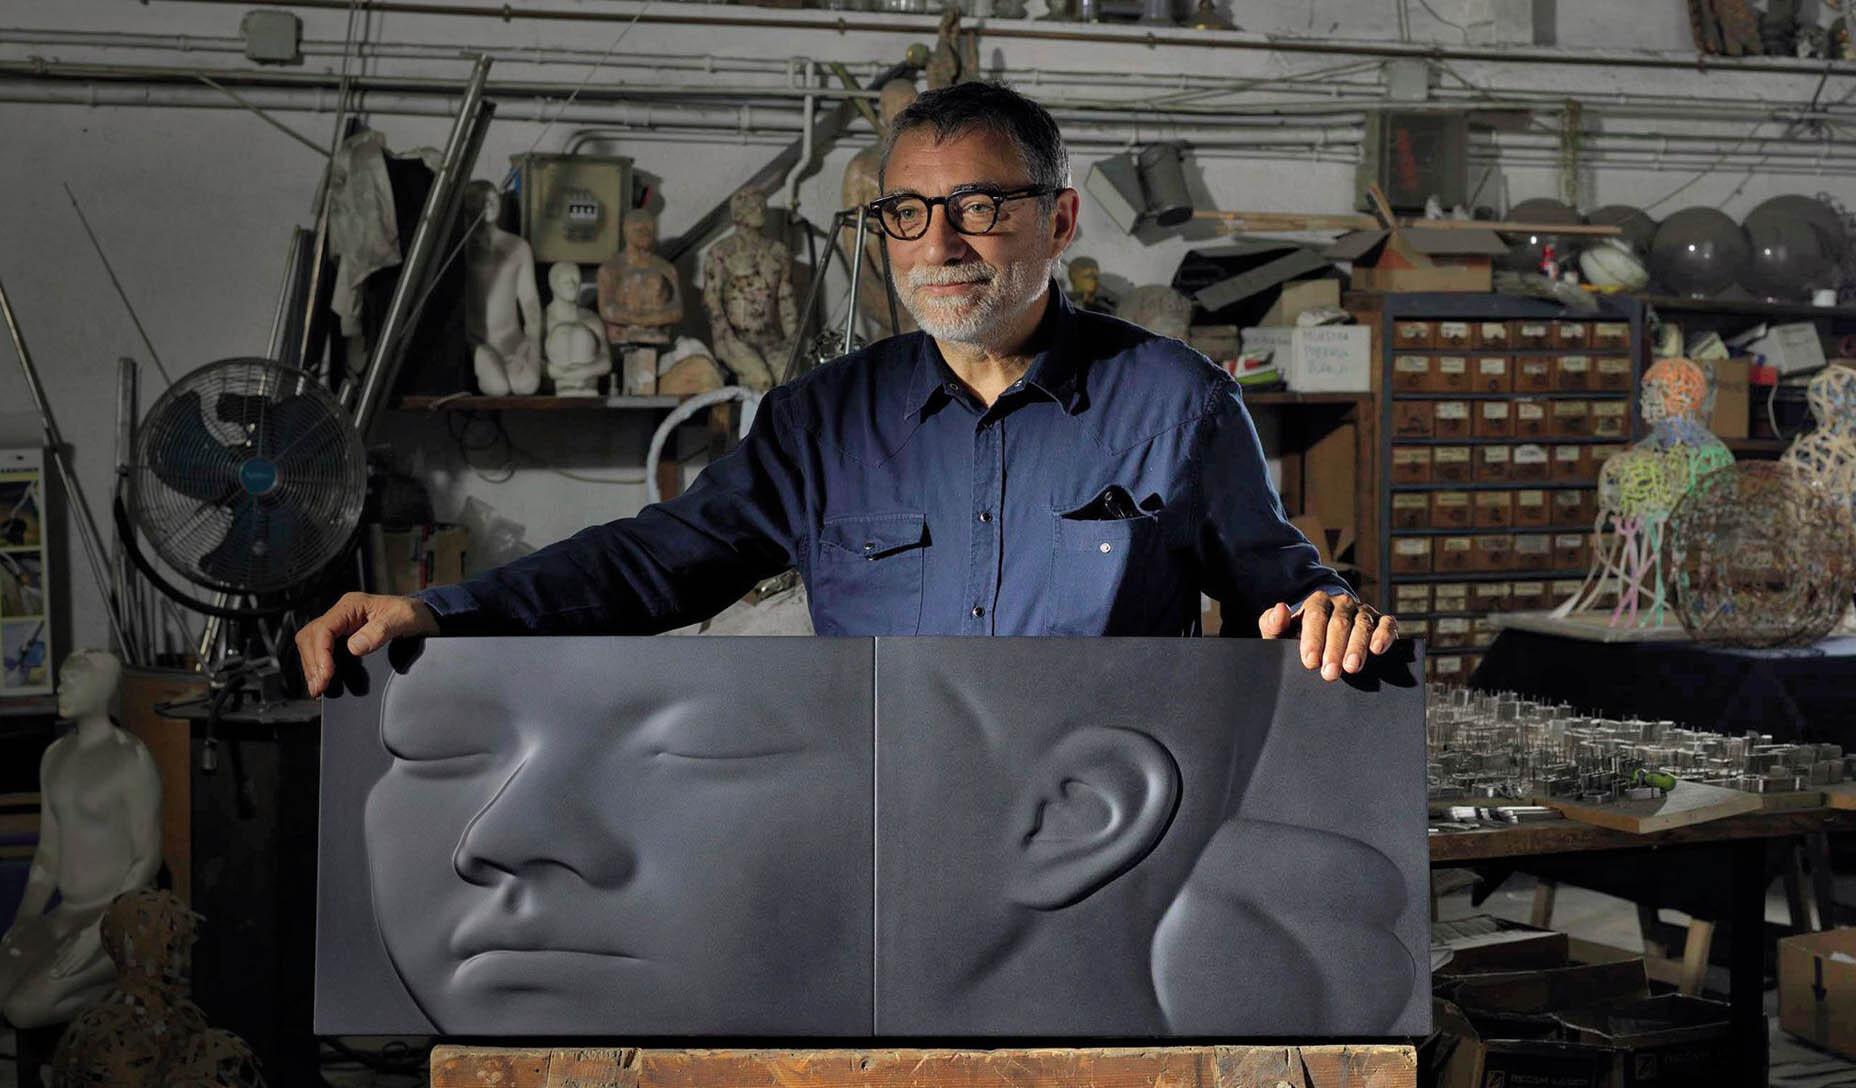 Artist Jaume Plensa standing with his Artika publication